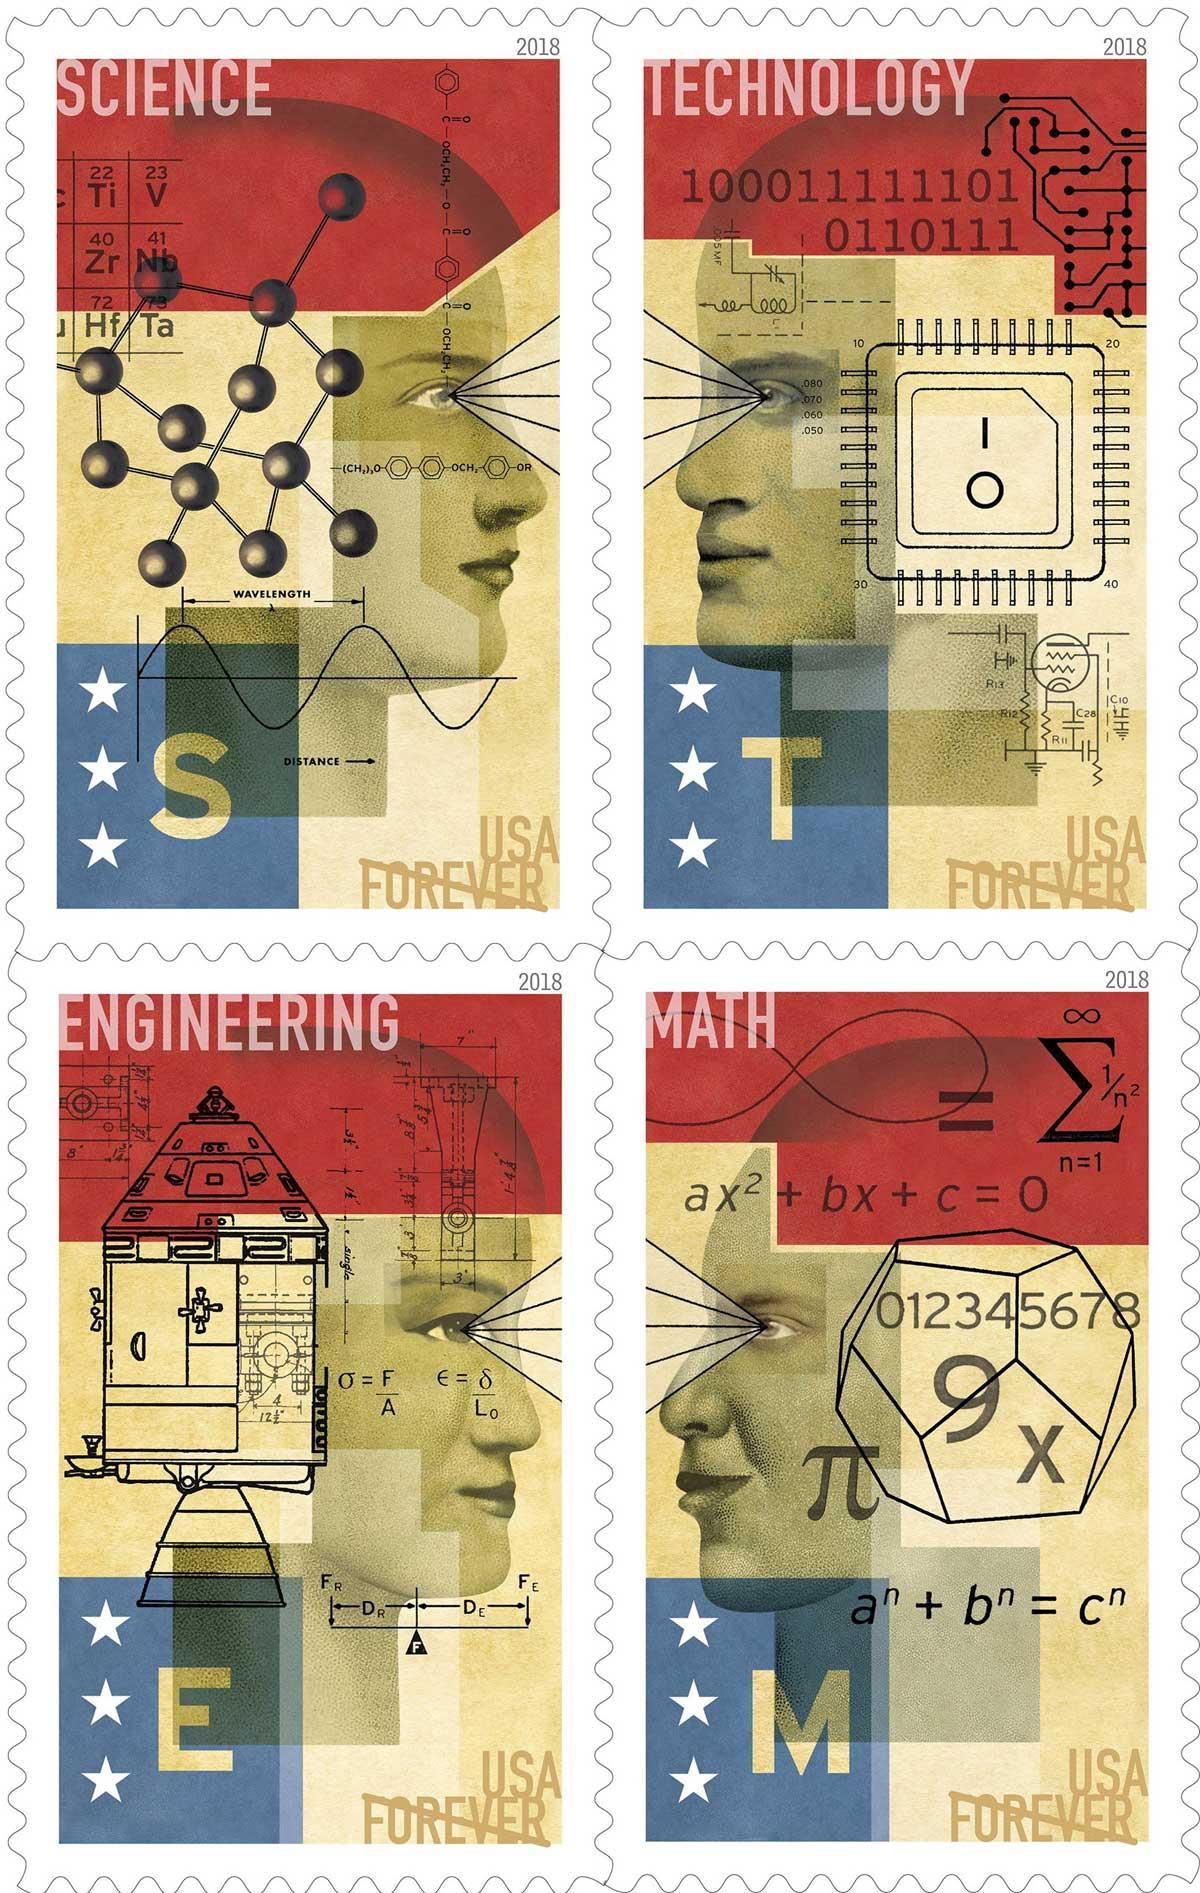 David Plunkert / STEM Stamps / United State Postal Service